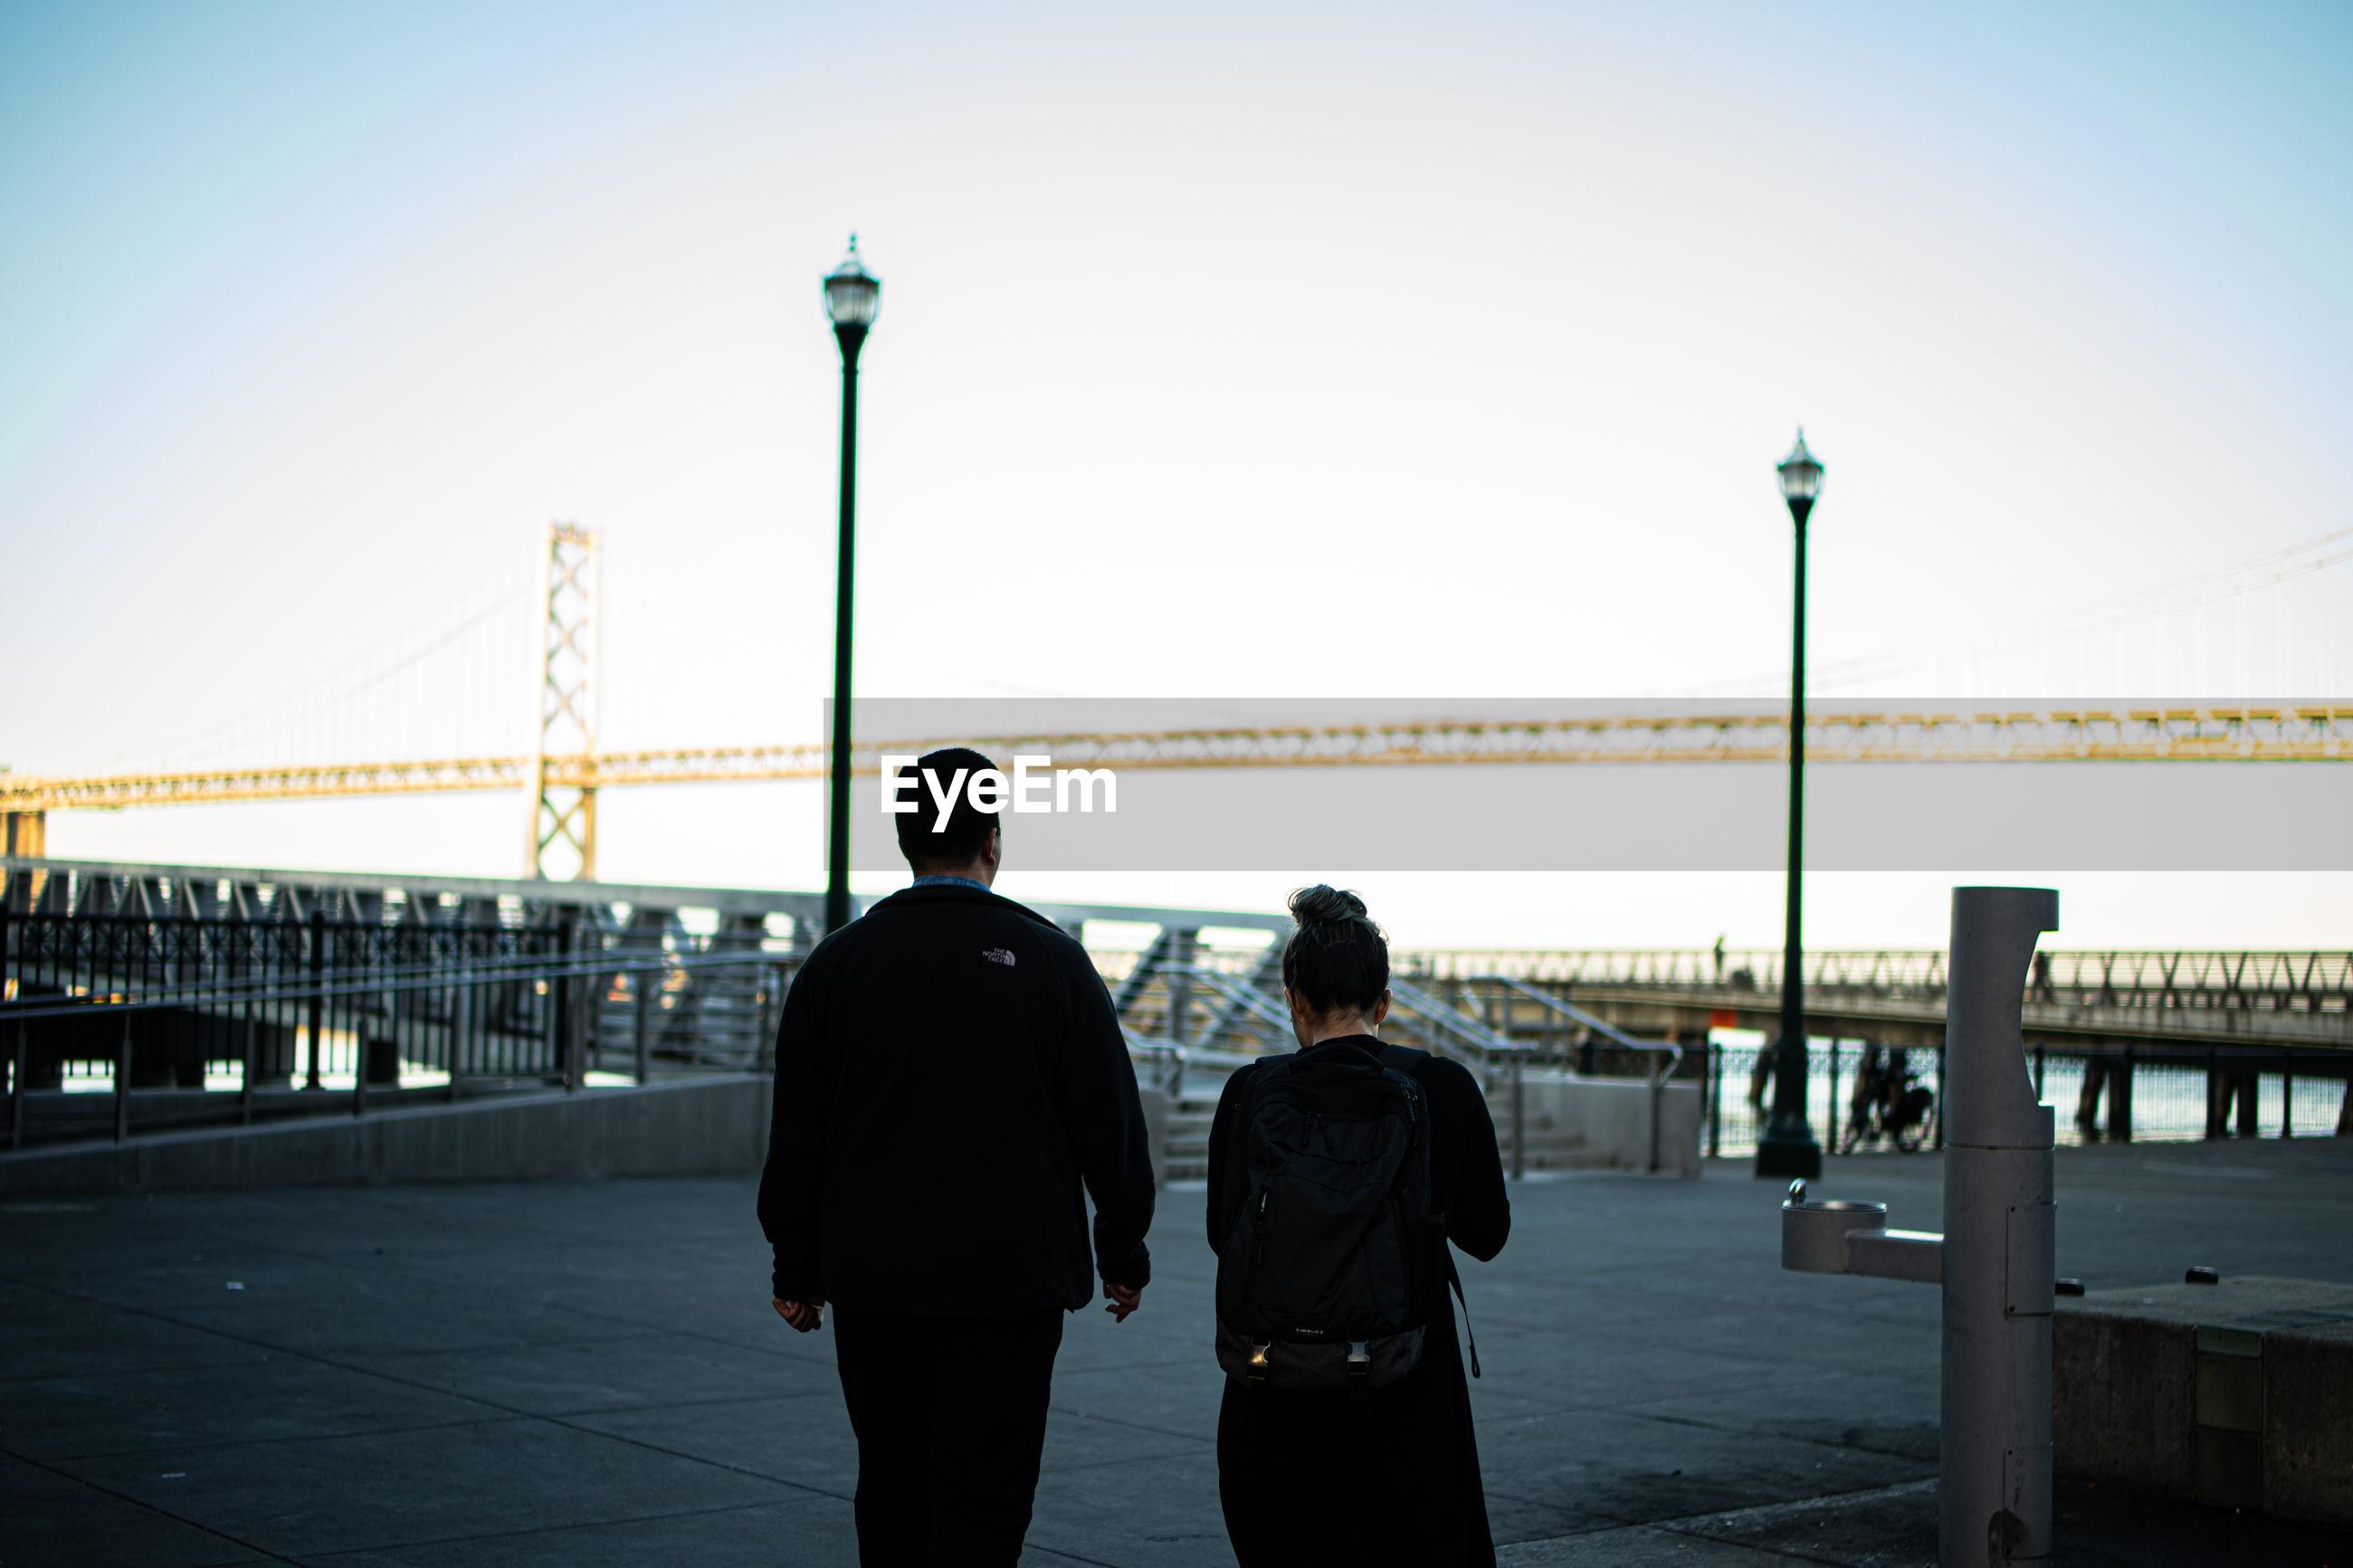 REAR VIEW OF FRIENDS STANDING ON BRIDGE AGAINST SKY